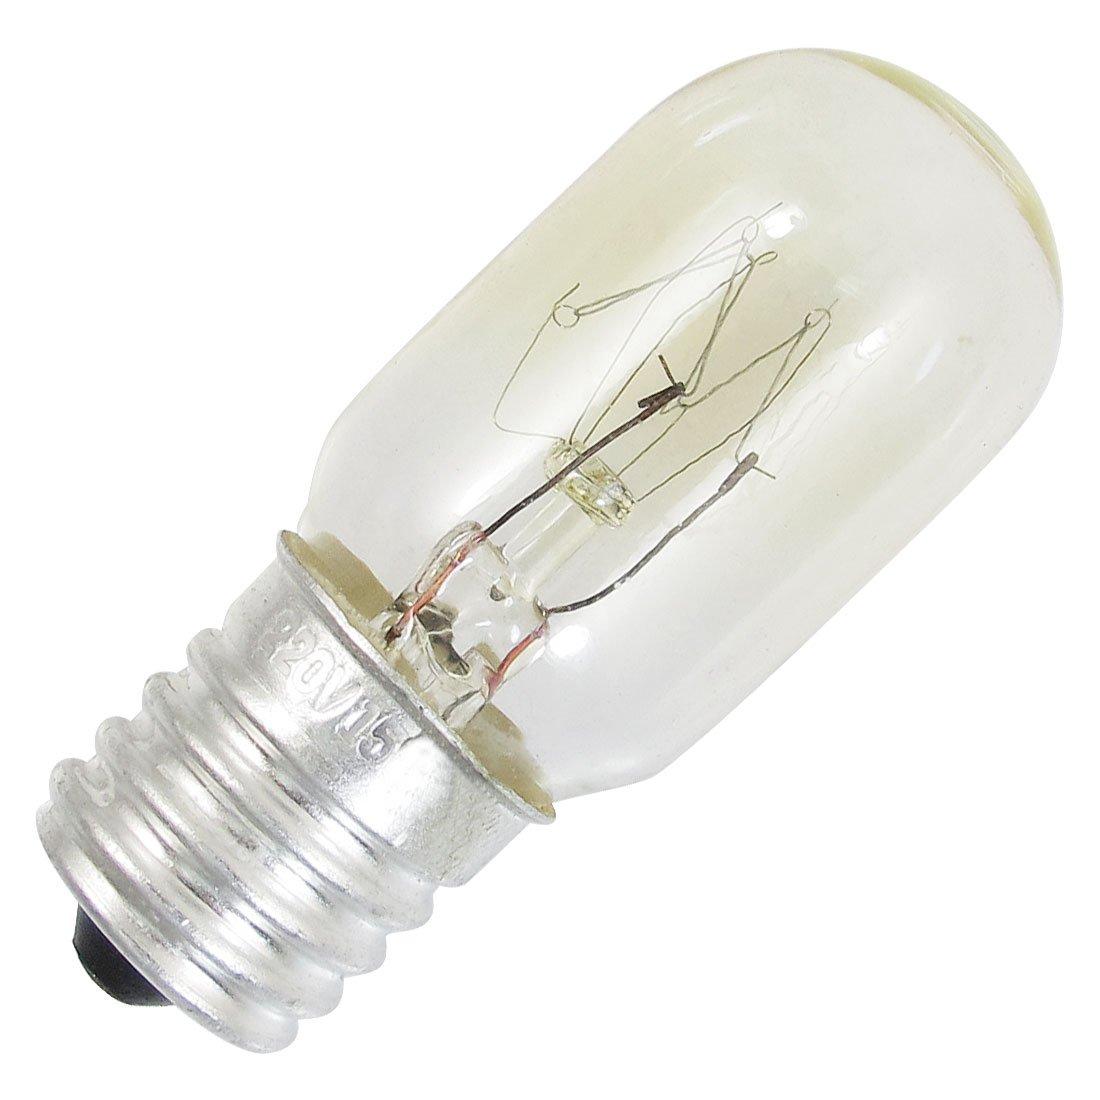 freezer fridge bulb e17 base warm white light lamp 220v. Black Bedroom Furniture Sets. Home Design Ideas